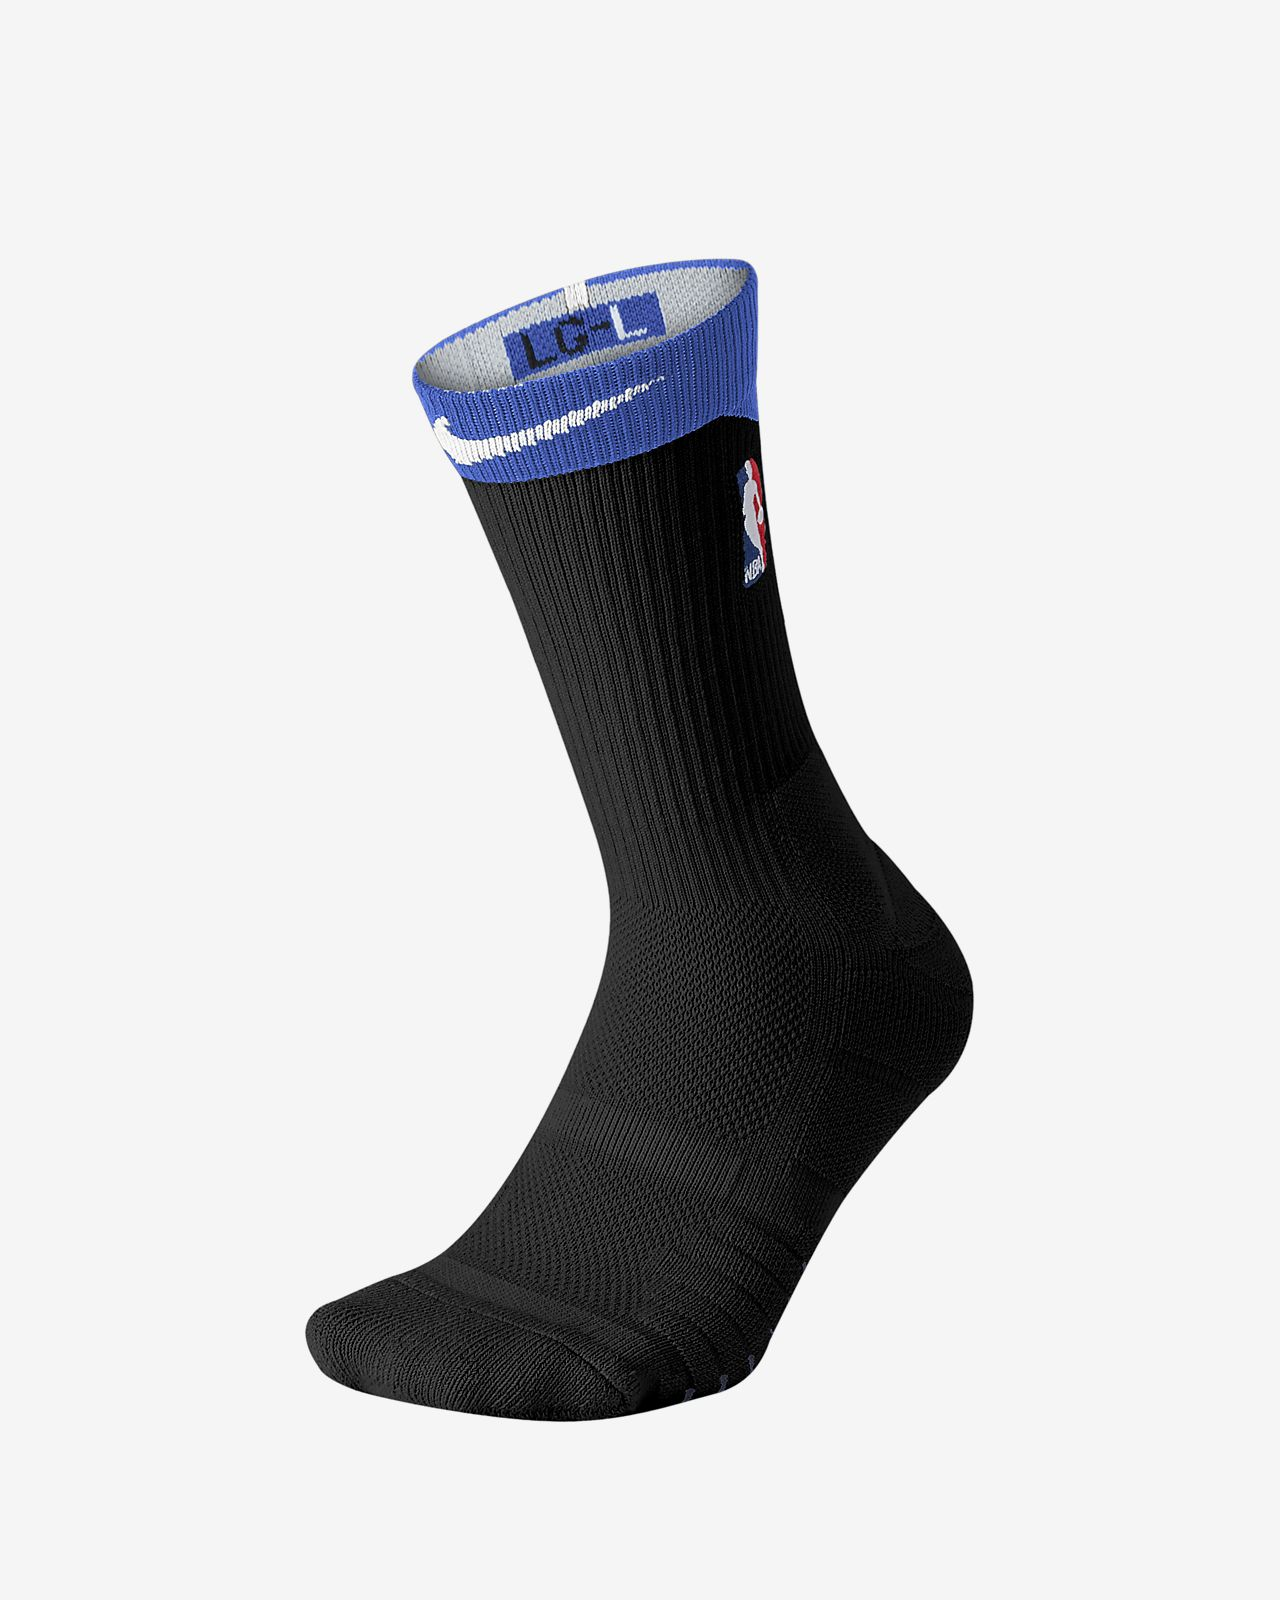 306168ad7dc5 Nike Elite Quick Crew NBA Socks. Nike.com CA